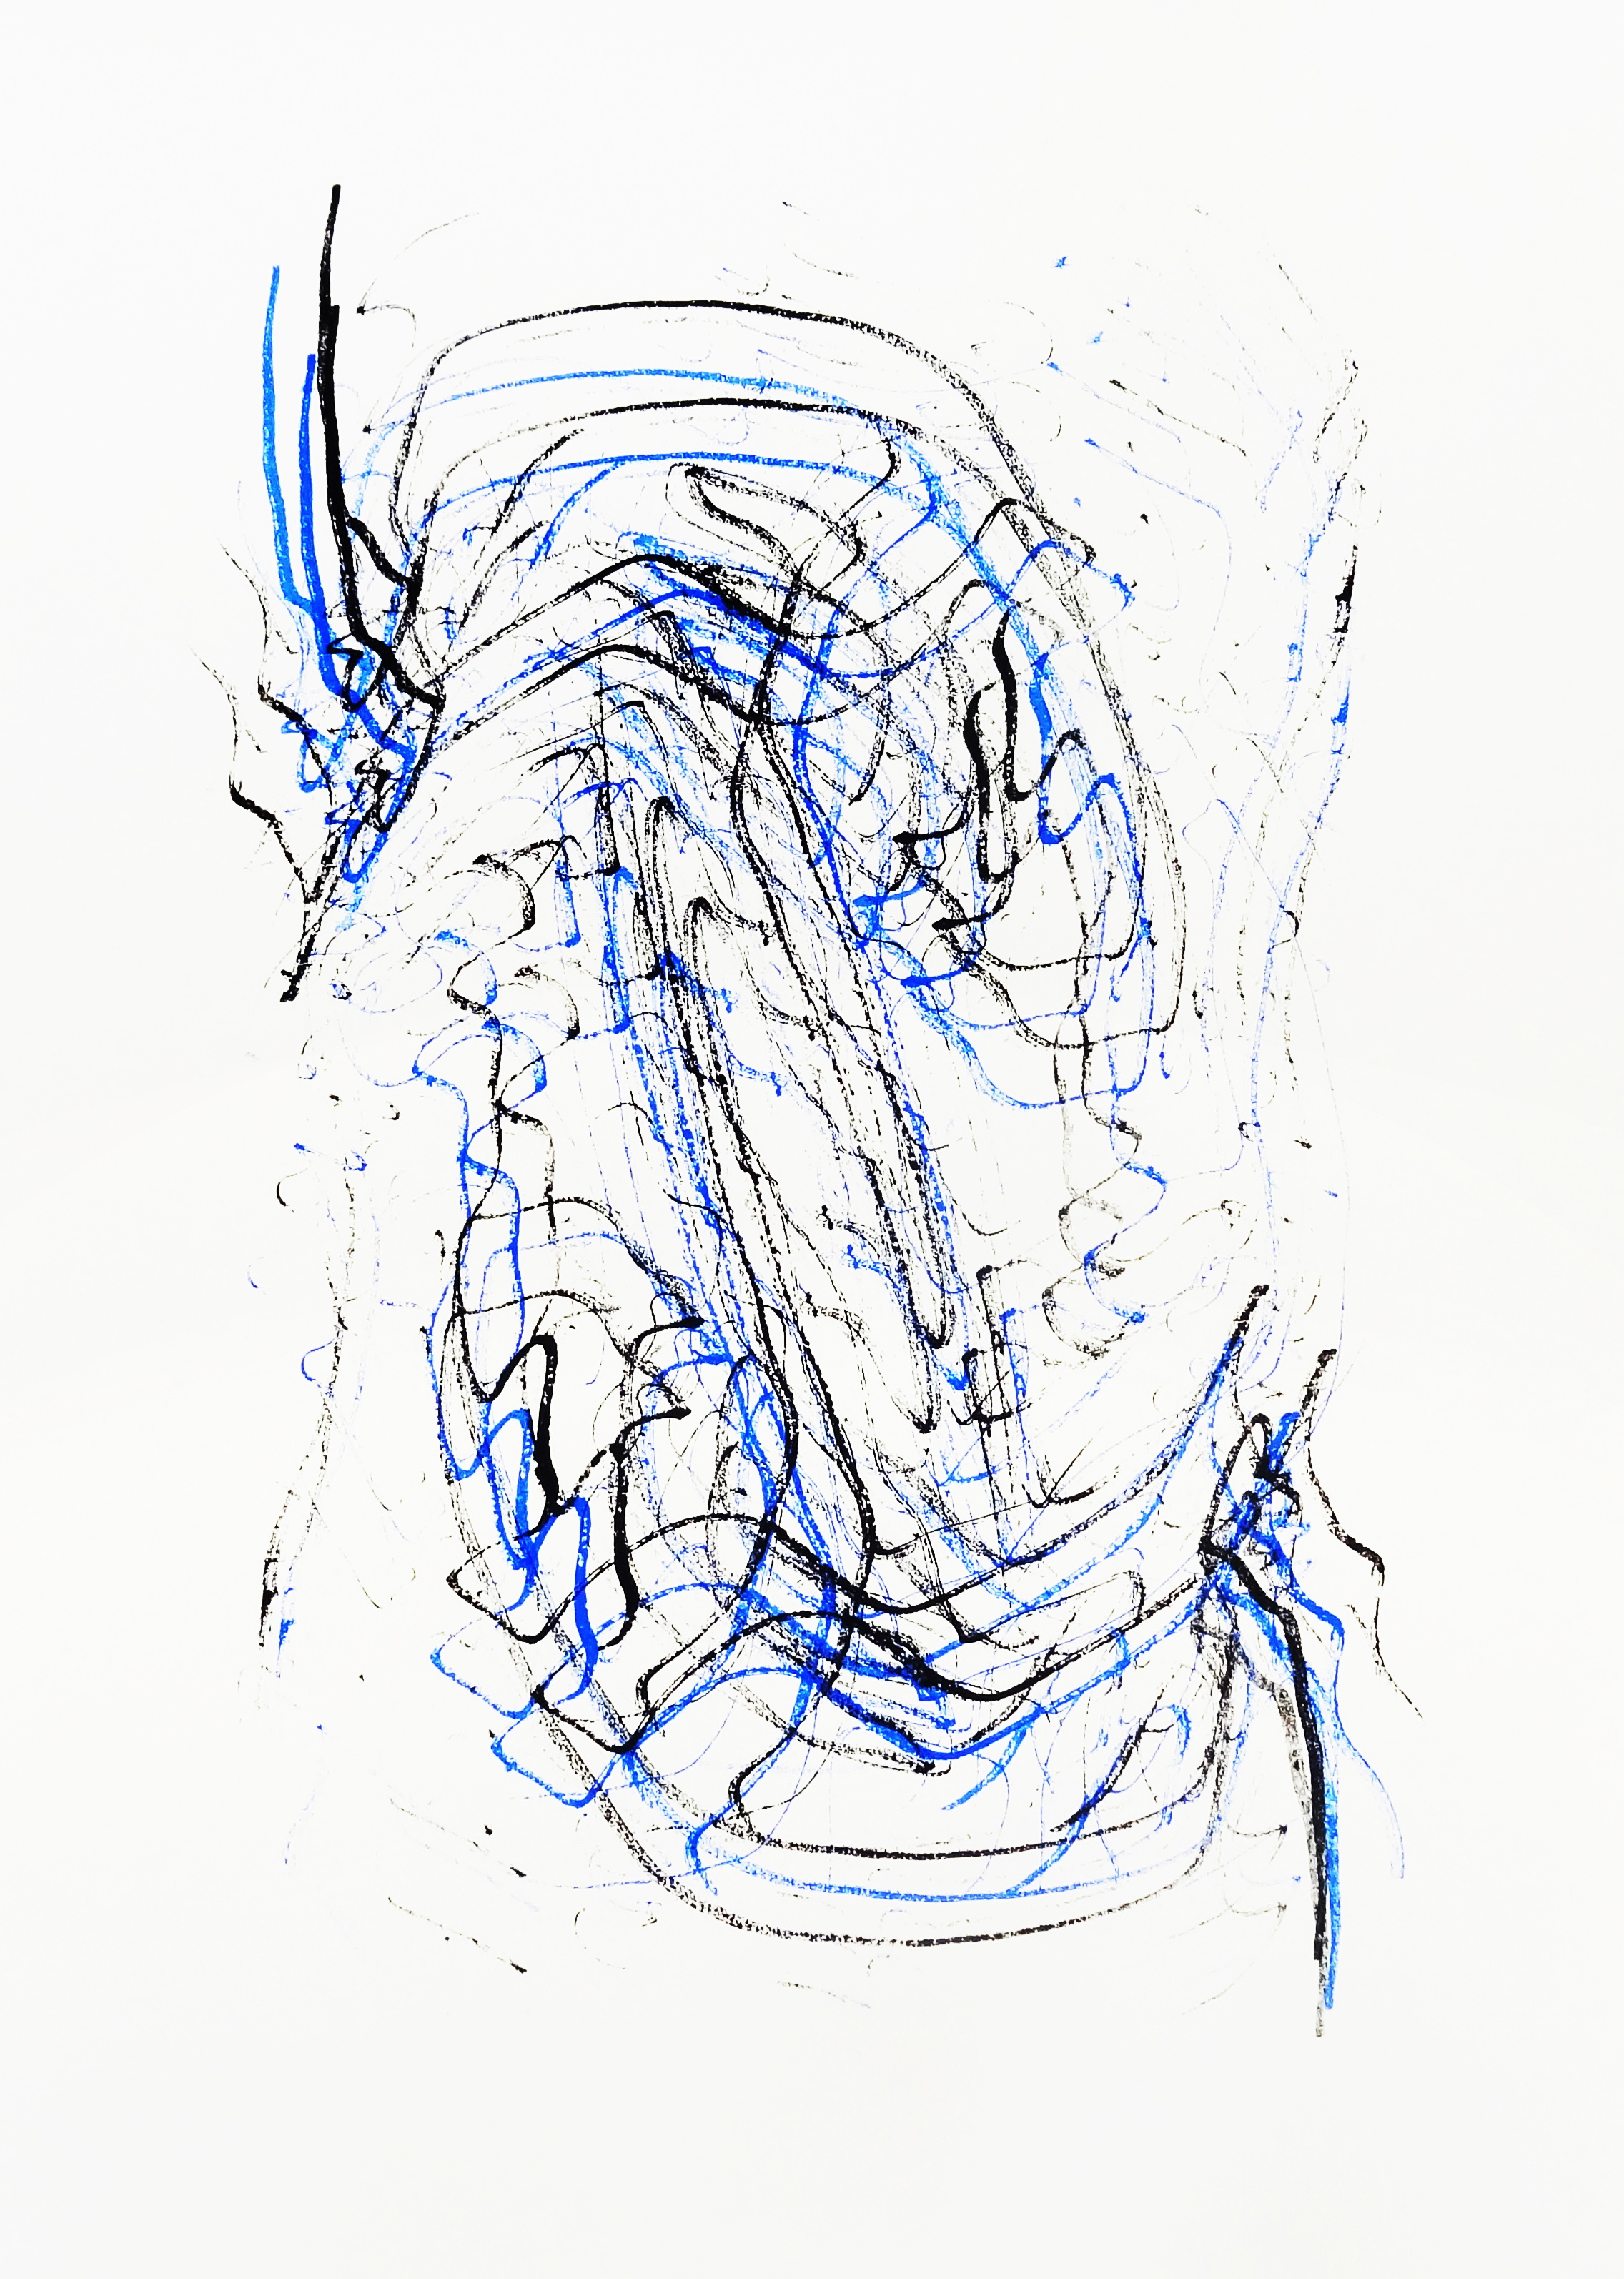 Untitled, 2015 acrylic on paper one-off screenprint 42,0 x 29,7 cm (2-15)